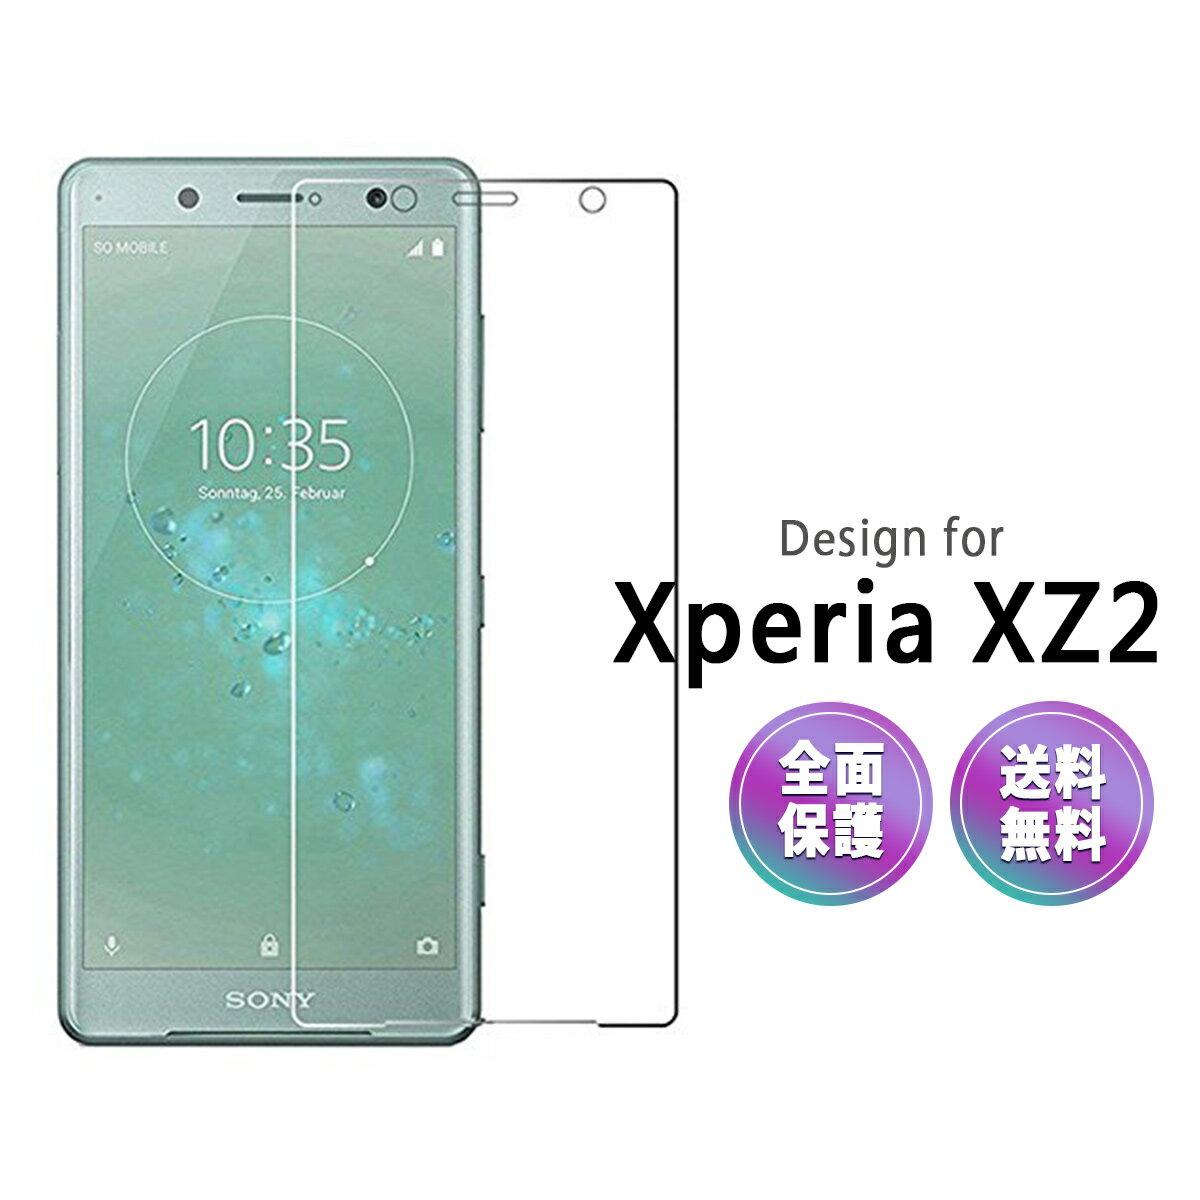 Xperia XZ2 Compact ガラスフィルム 全面 保護 docomo SO-05K エクスペリア XZ 2 コンパクト 液晶 画面 滑らか 3D 感度良好 硬度 9H CLEAR クリア【マラソン】買いまわり